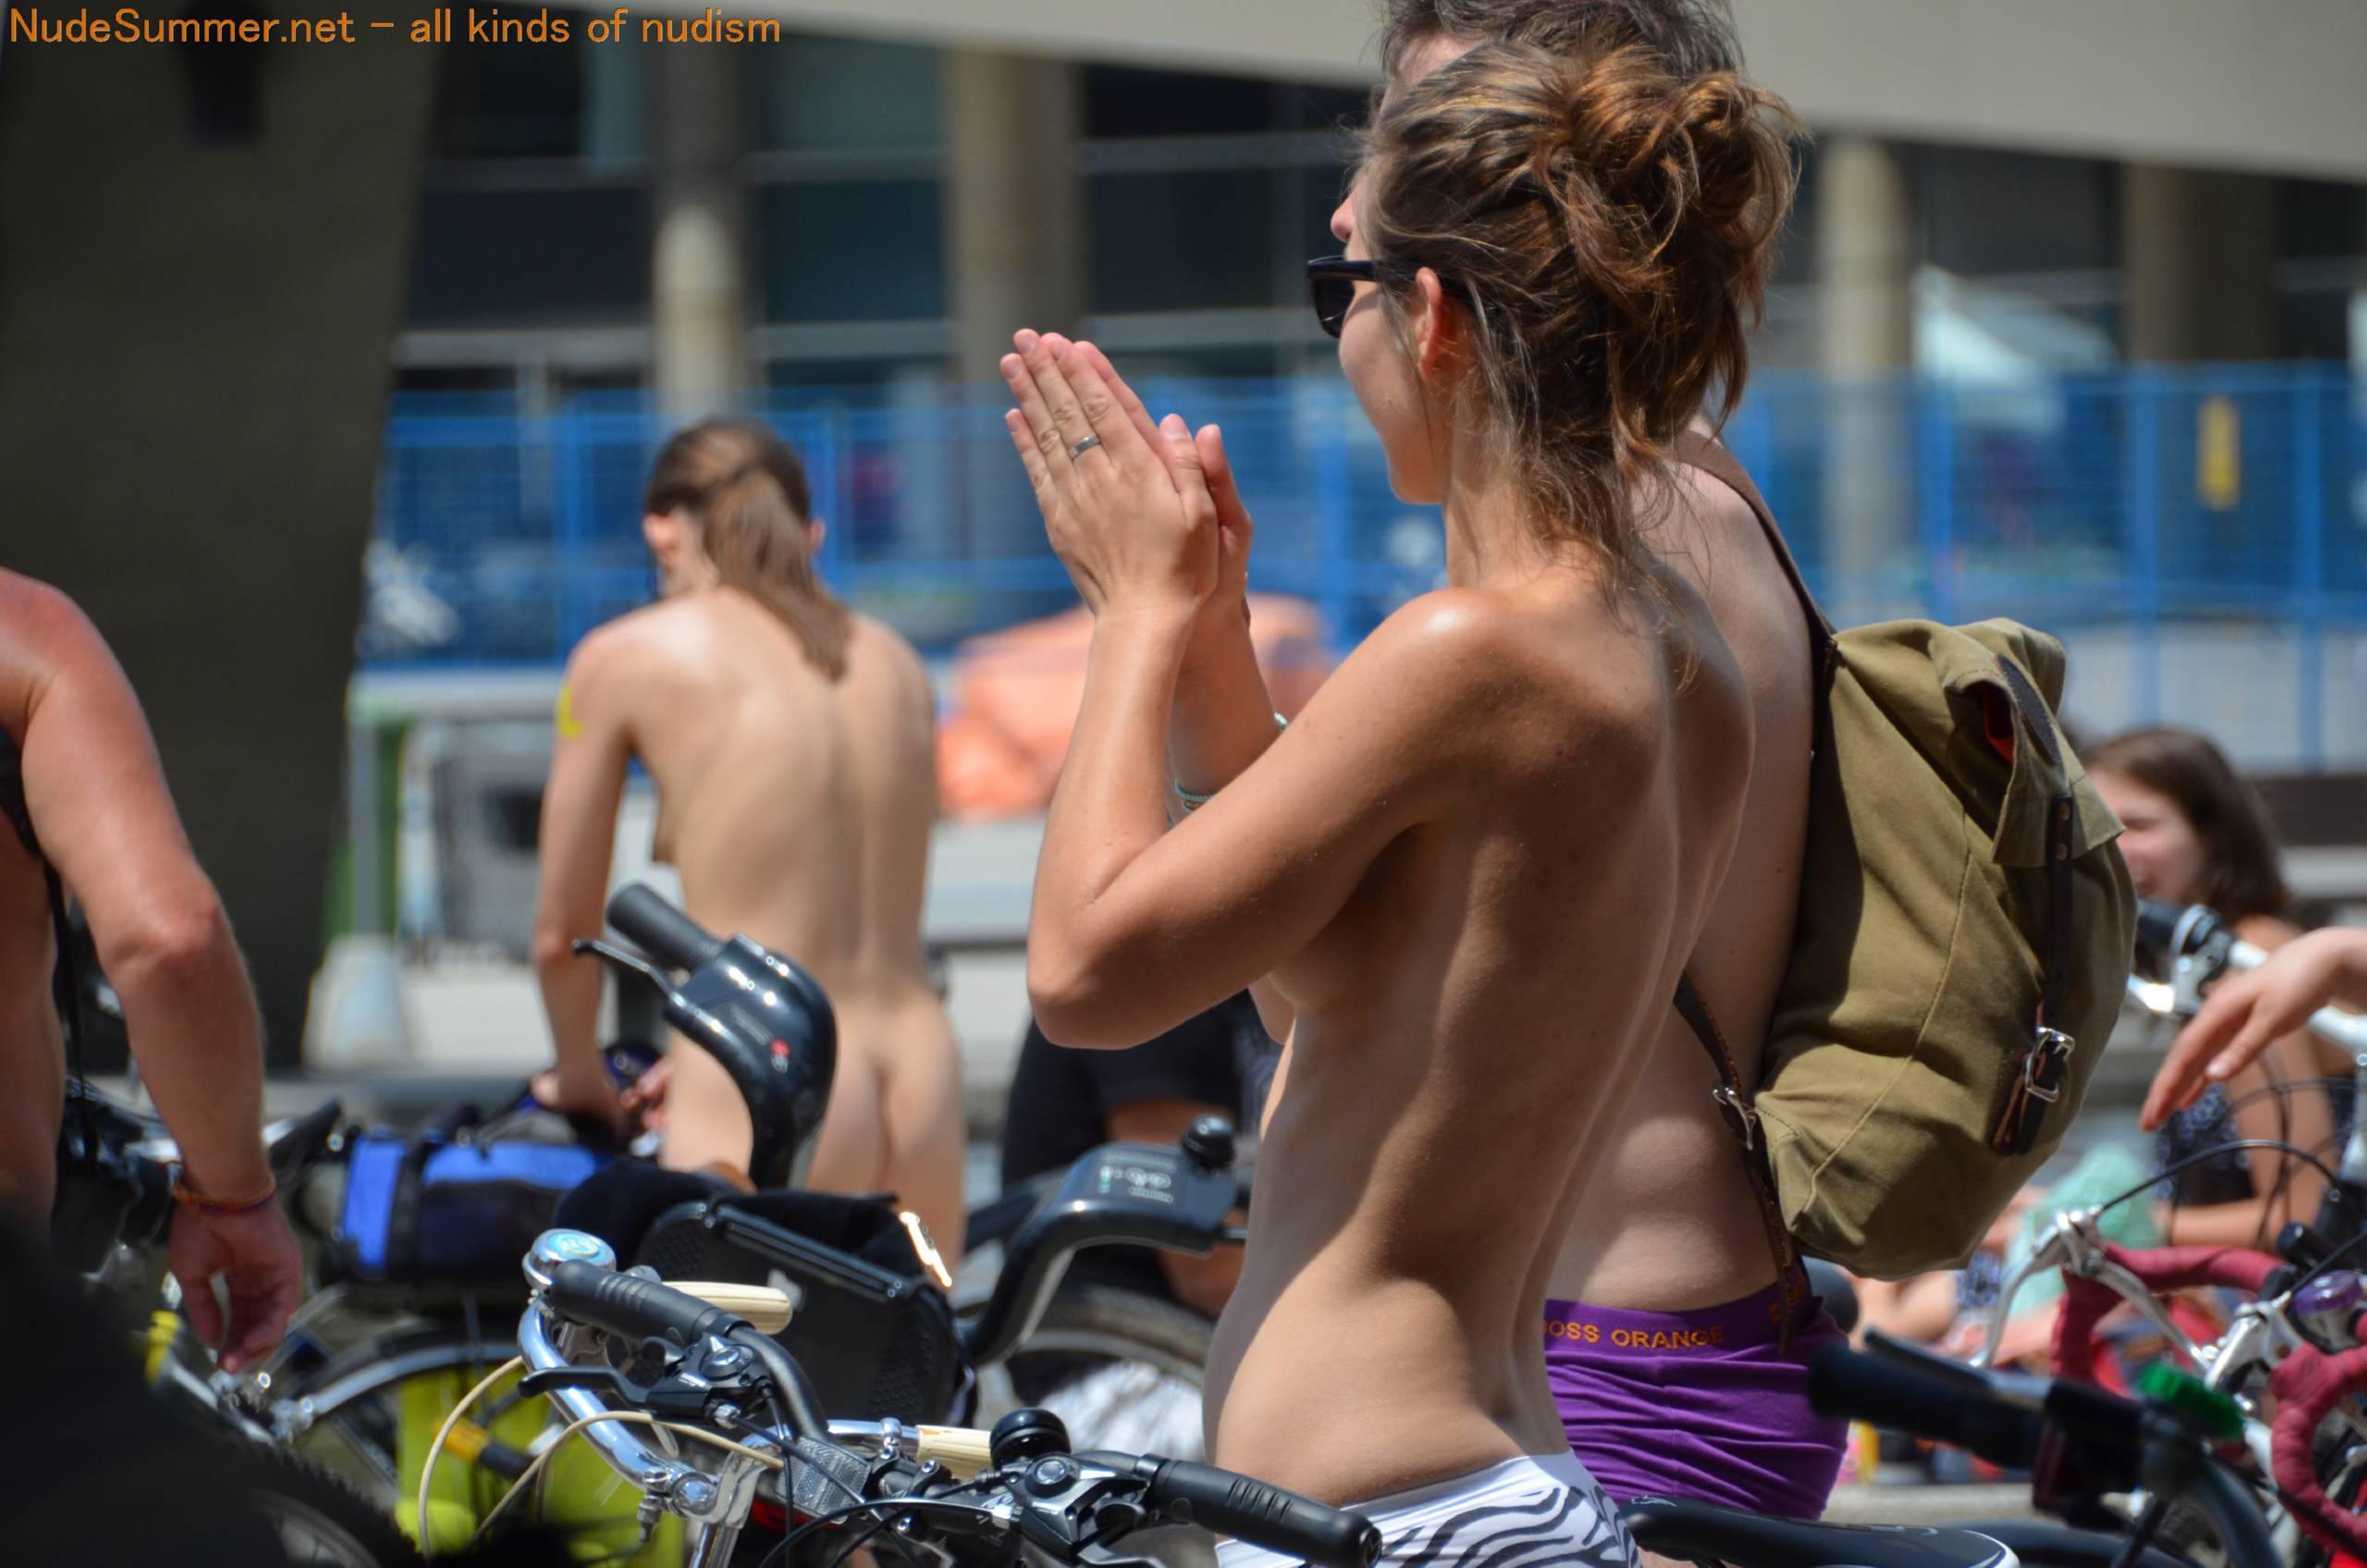 World Naked Bike Ride (WNBR) 2012 Part 2 - 2